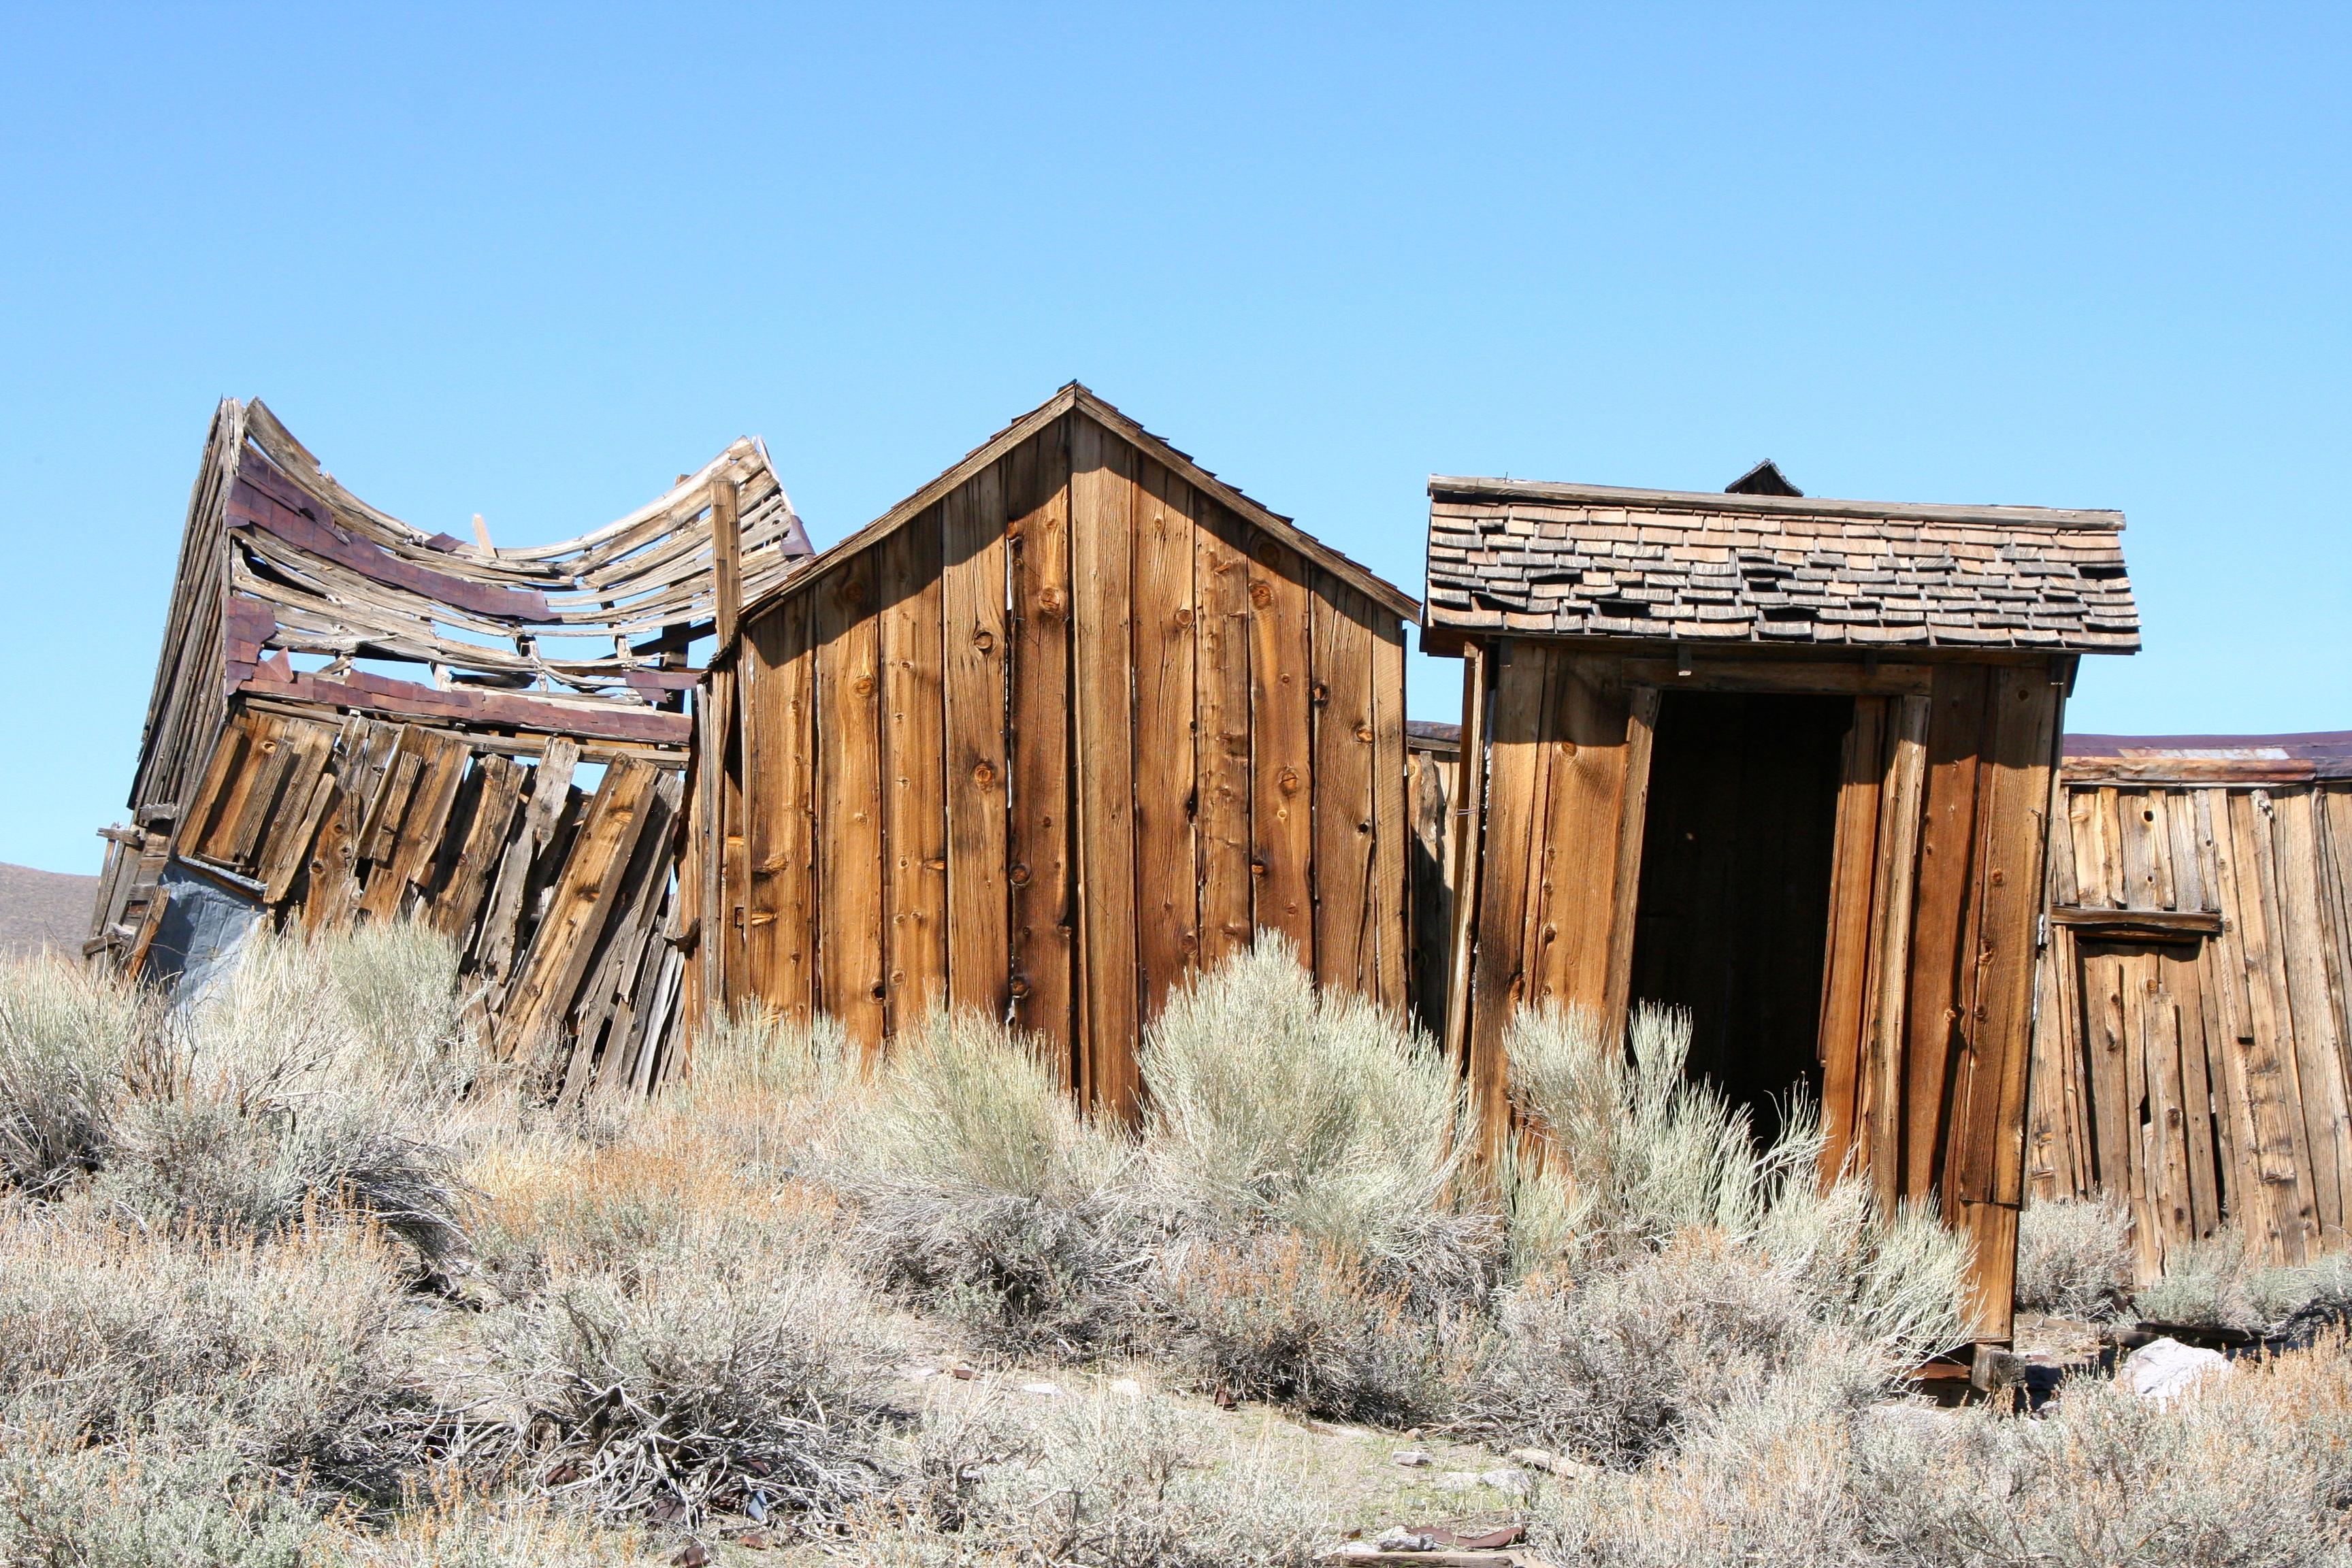 Bones of building at Bodie State Park in California.